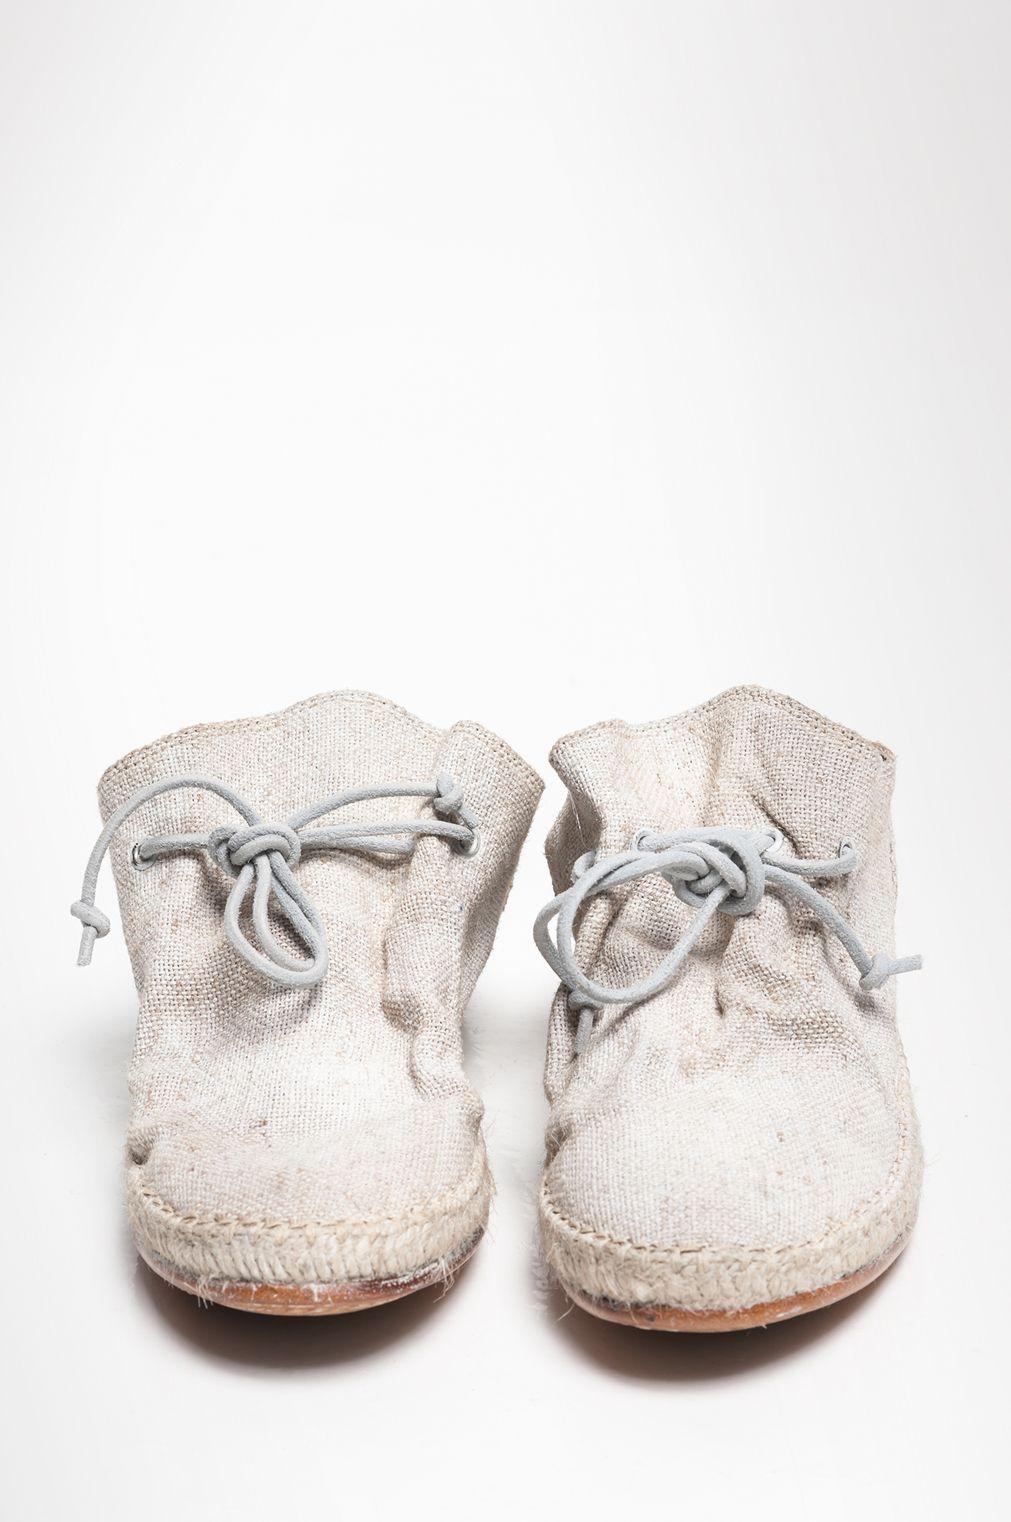 STIP LINEN › flat shoes › HUMANOID WEBSHOP